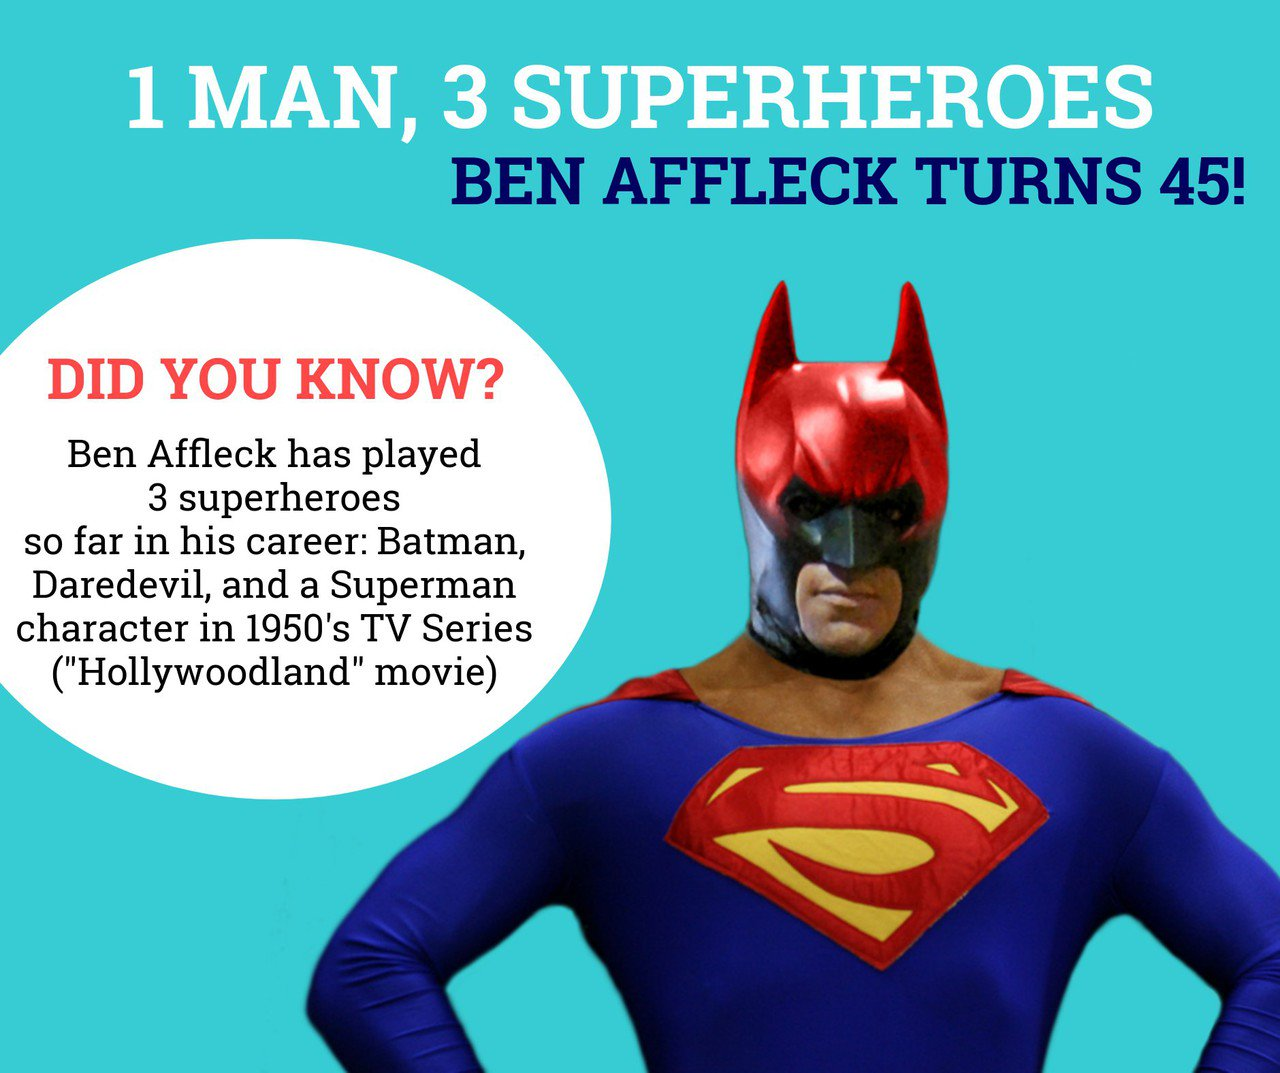 Happy Bday, Ben Affleck!